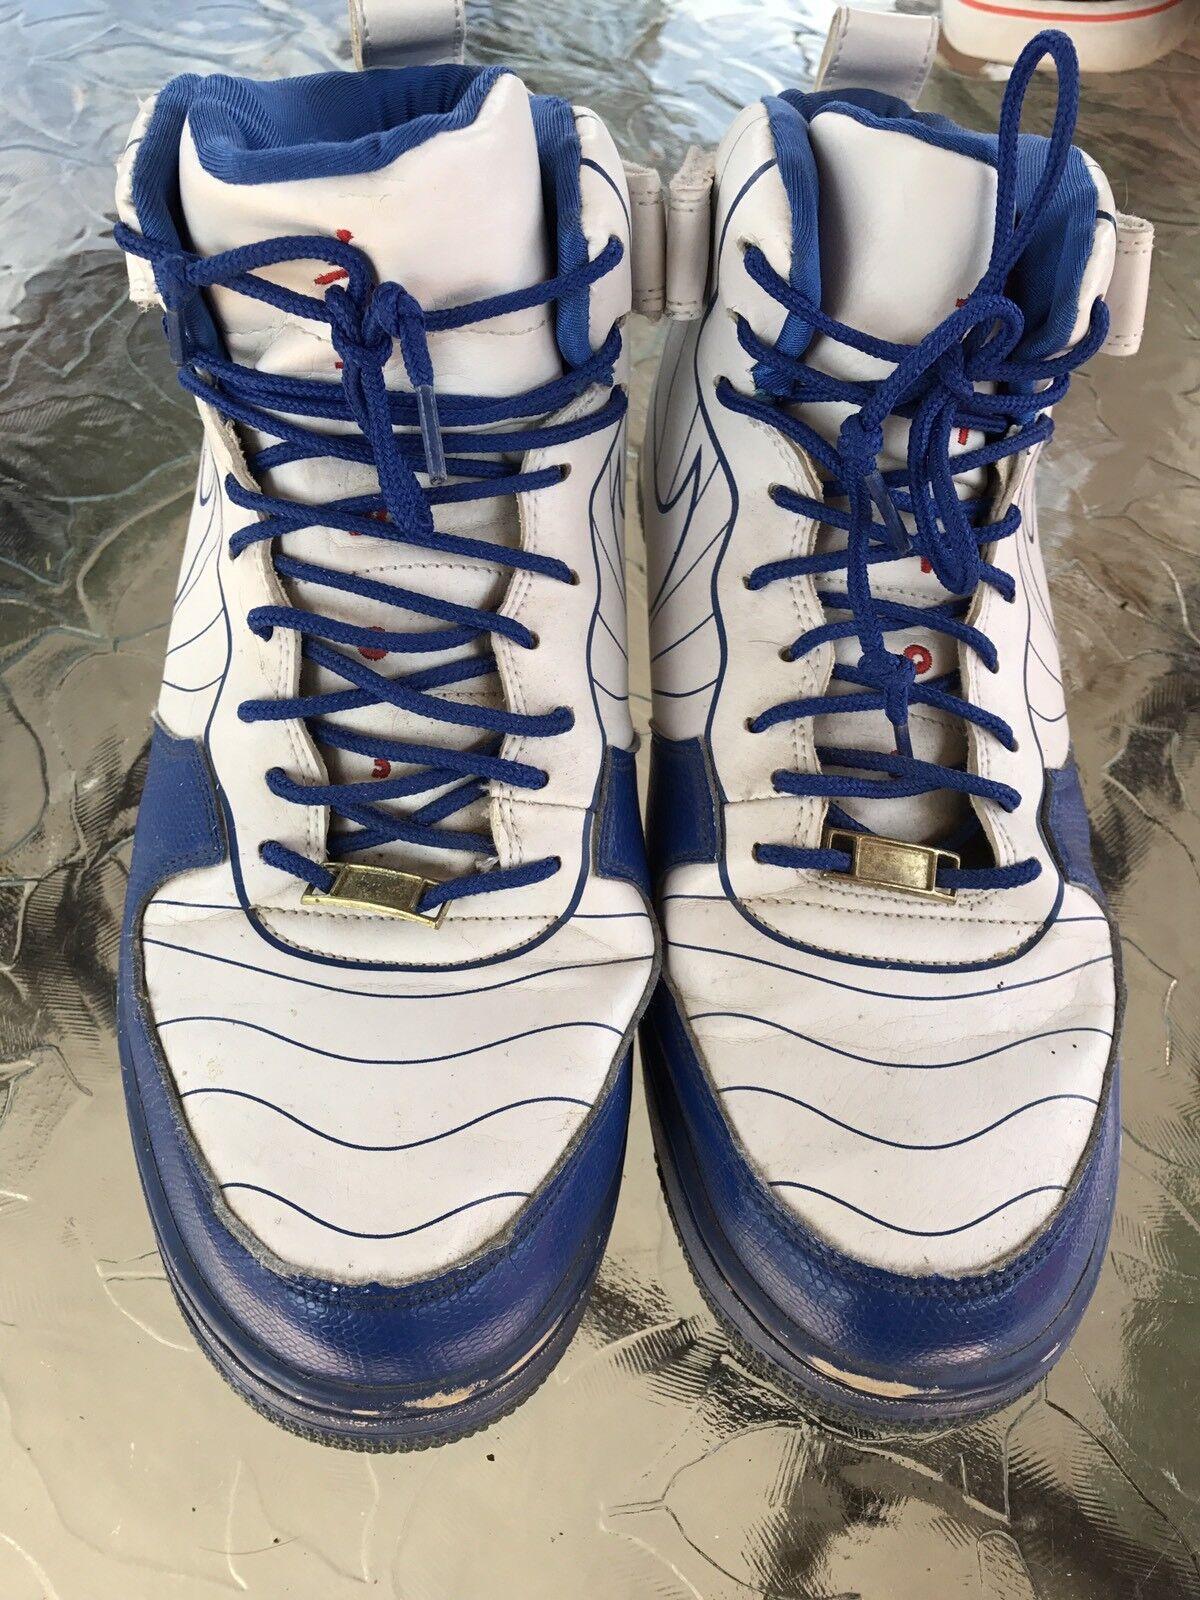 Nike jordan 11,5 scarpe basket bianco & blu attiva scarpe alte scarpe 11,5 da tennis 418cb9